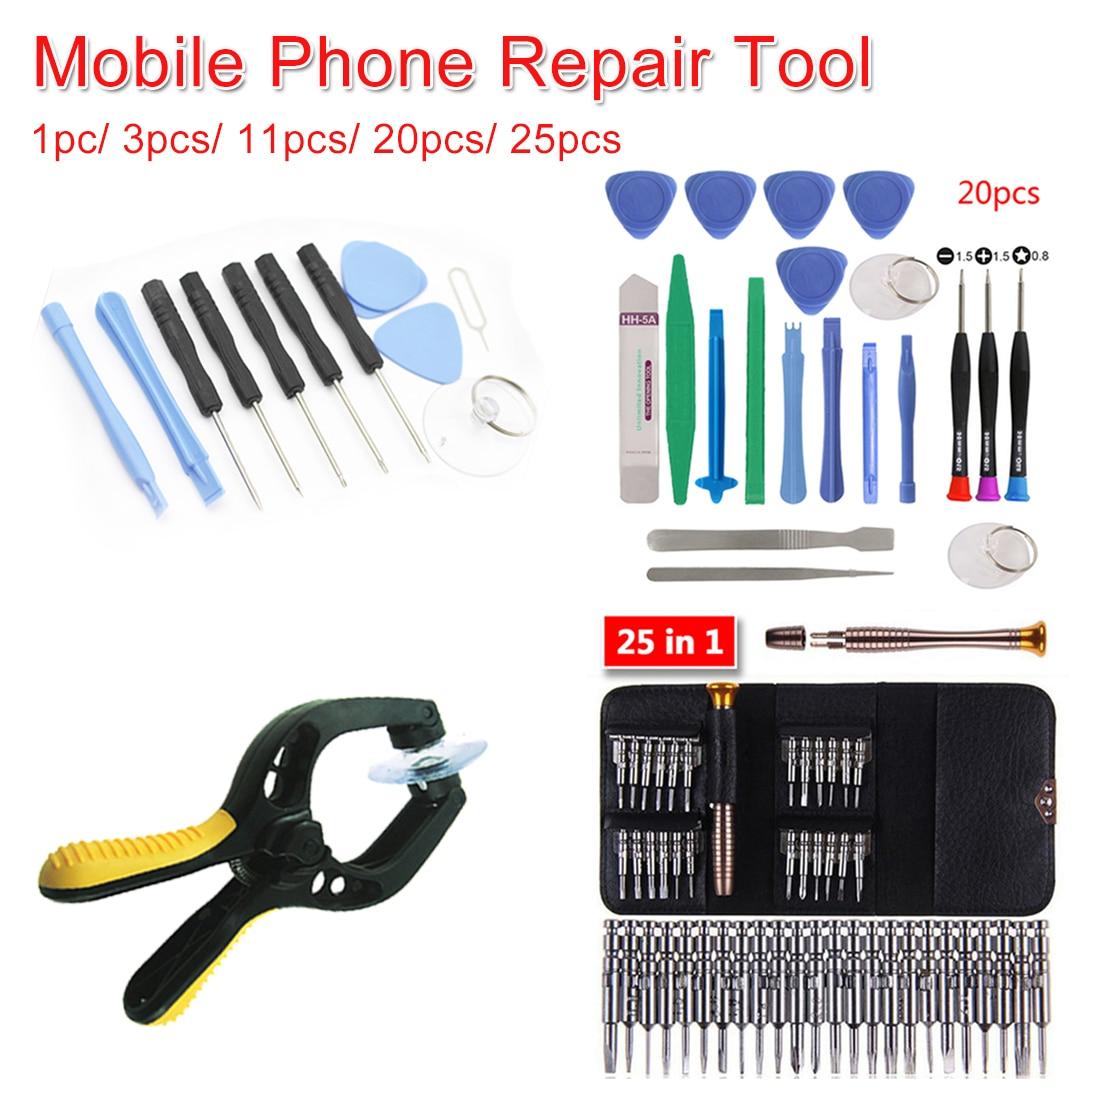 Mobile Phone Repair Tool Kit 3pcs/11pcs/20pcs/25pcs Cell Phones Opening Screwdriver Set For Iphone/Samsung/Xiaomi Hand Tool Set